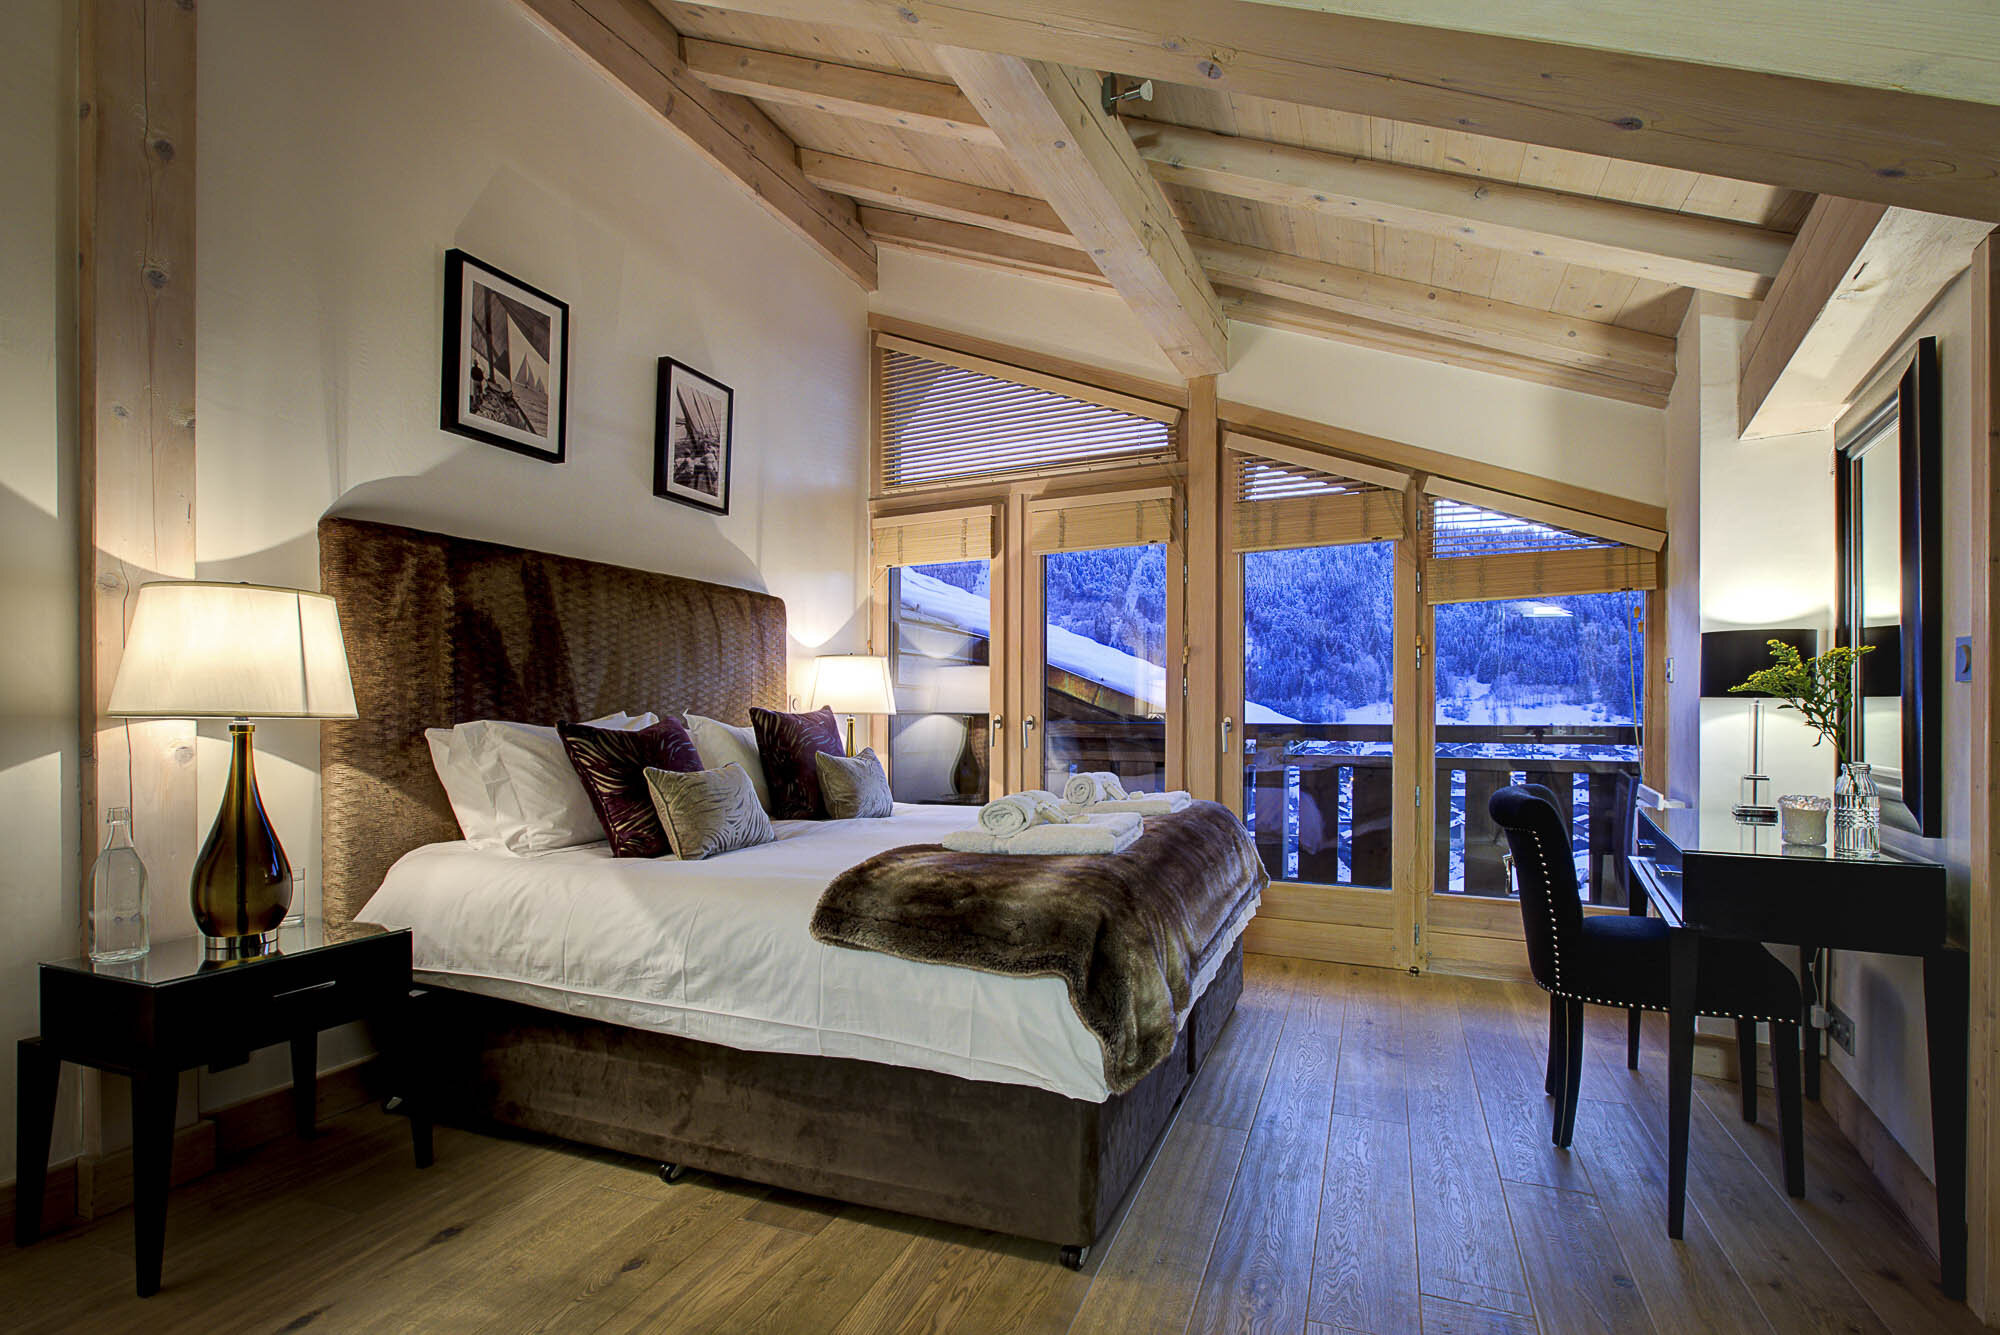 tg-ski-luxury-chalet-bouquetin-morzine-018.jpg